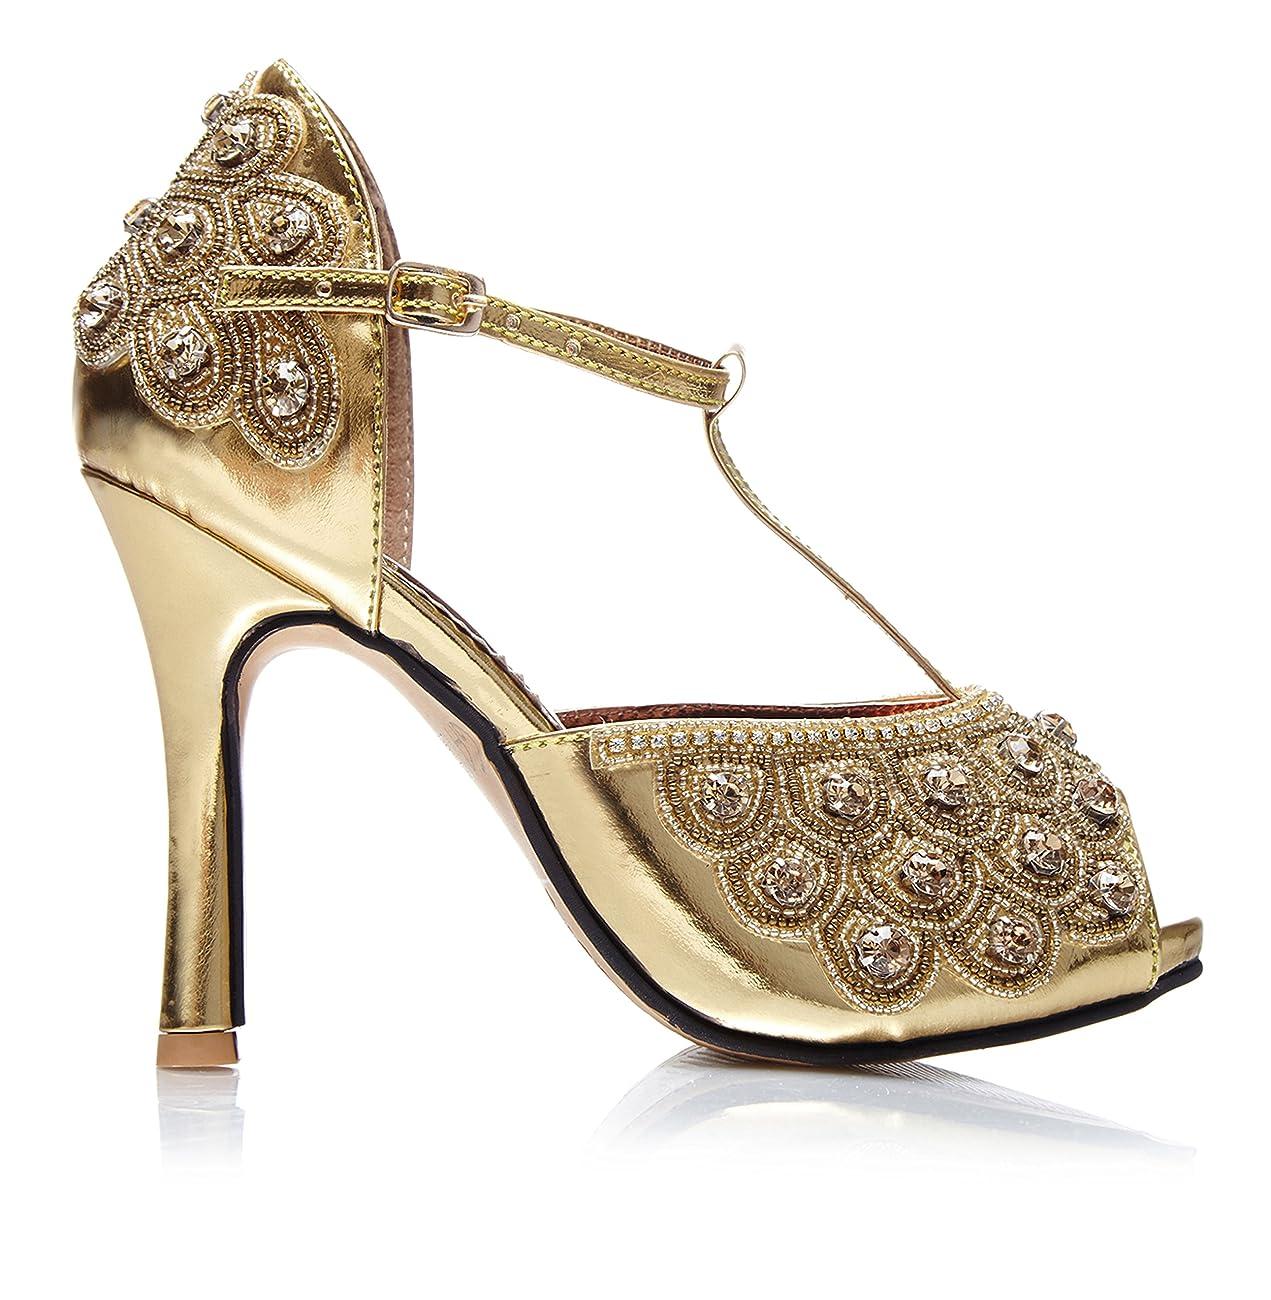 Donna Vintage Inspired T-Strap Heels in Gold 0